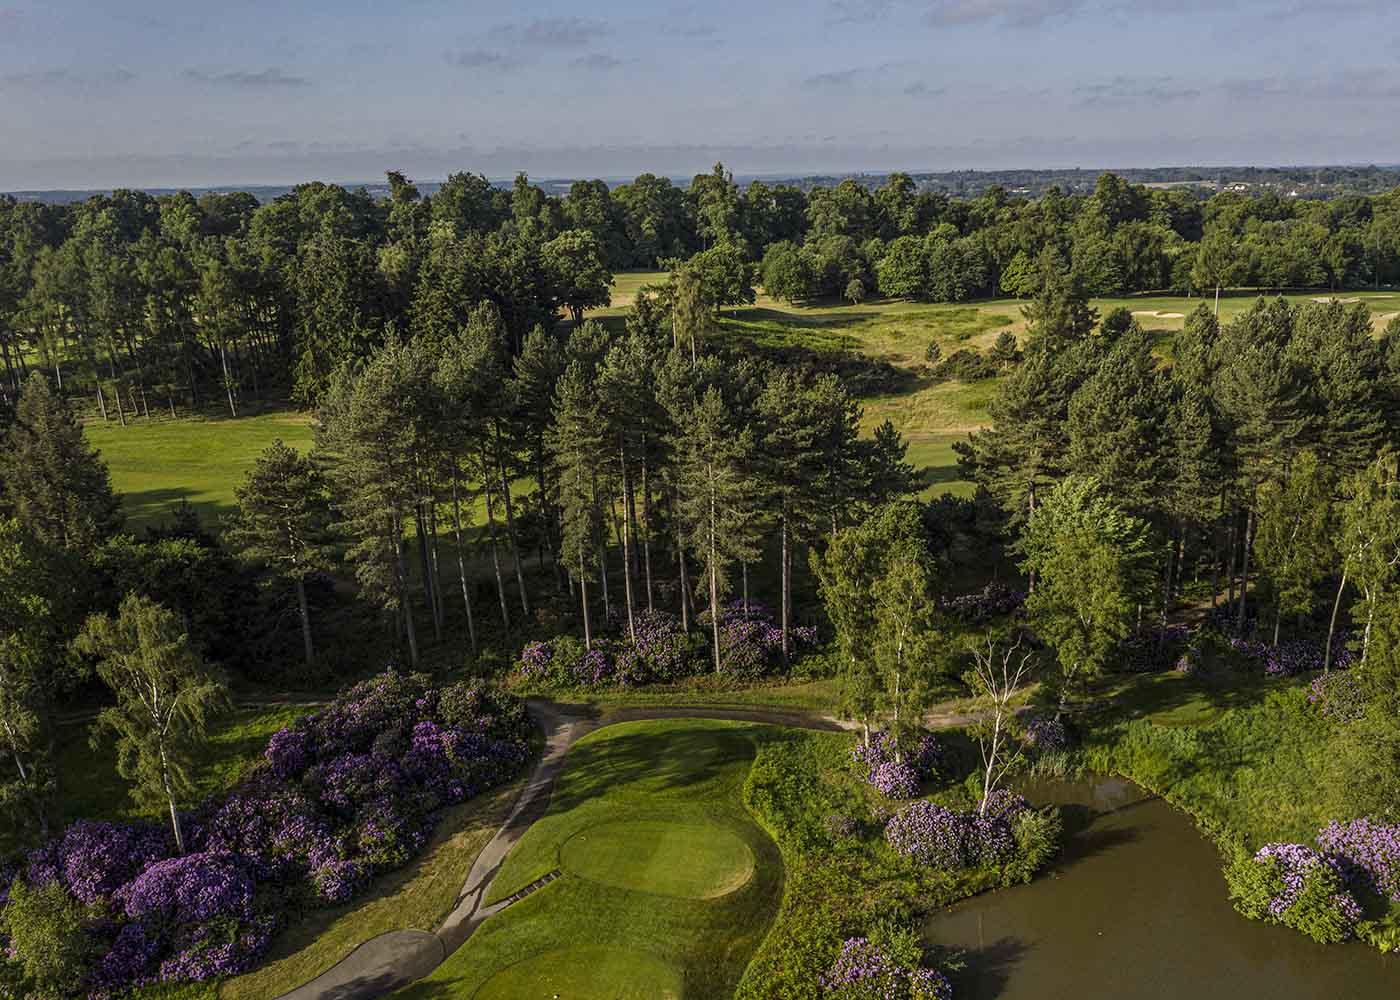 Golf Drone Photographer